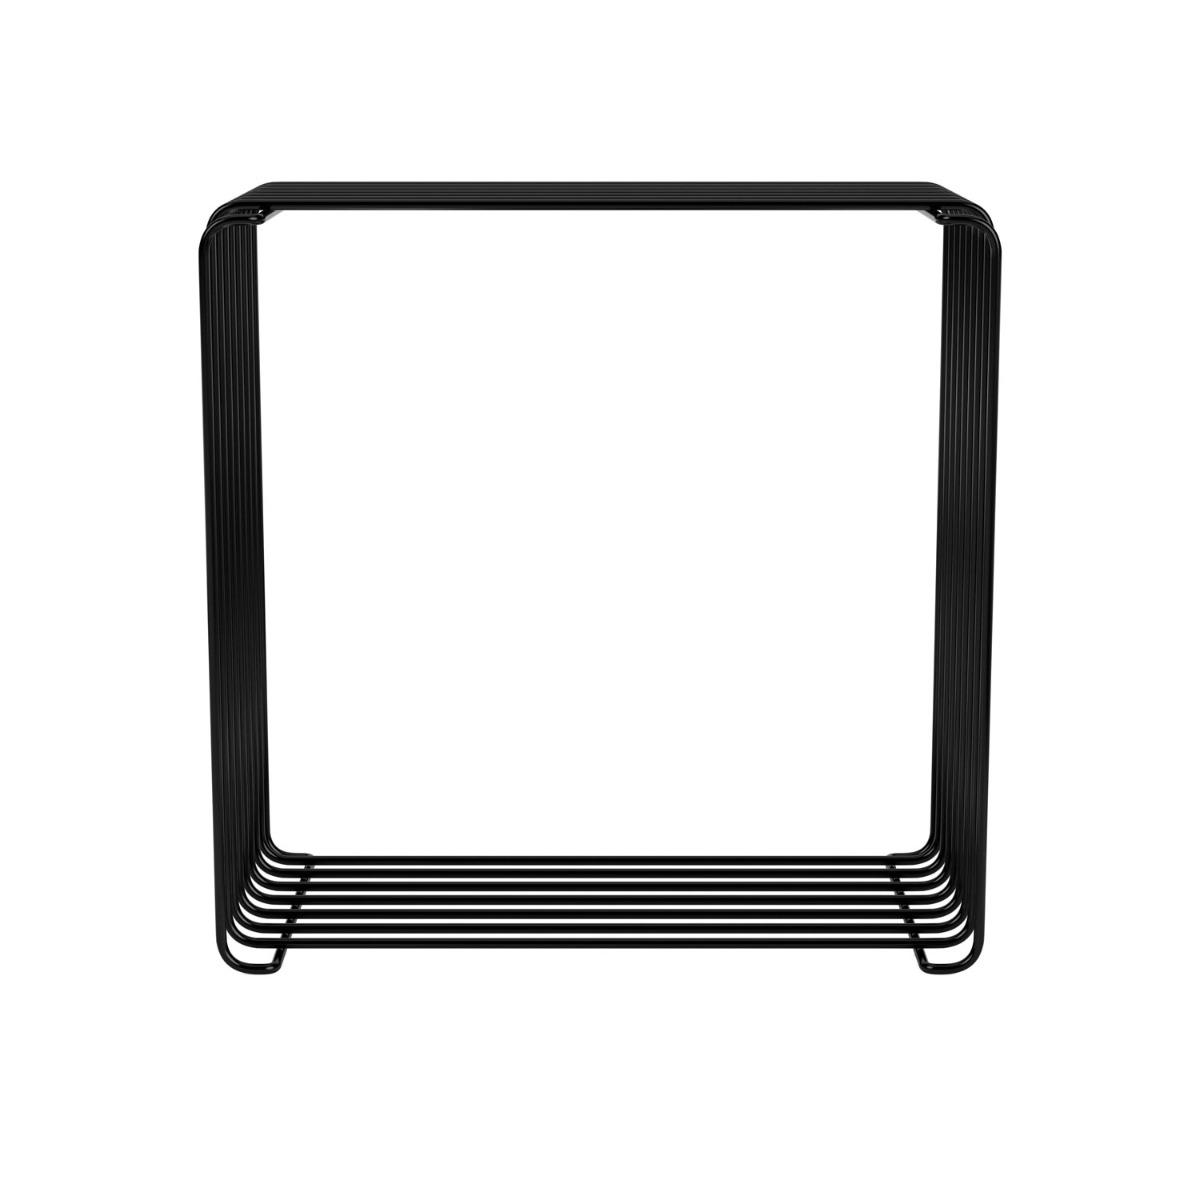 Montana Förvaringsmodul Wire 34,8x18,8cm Black